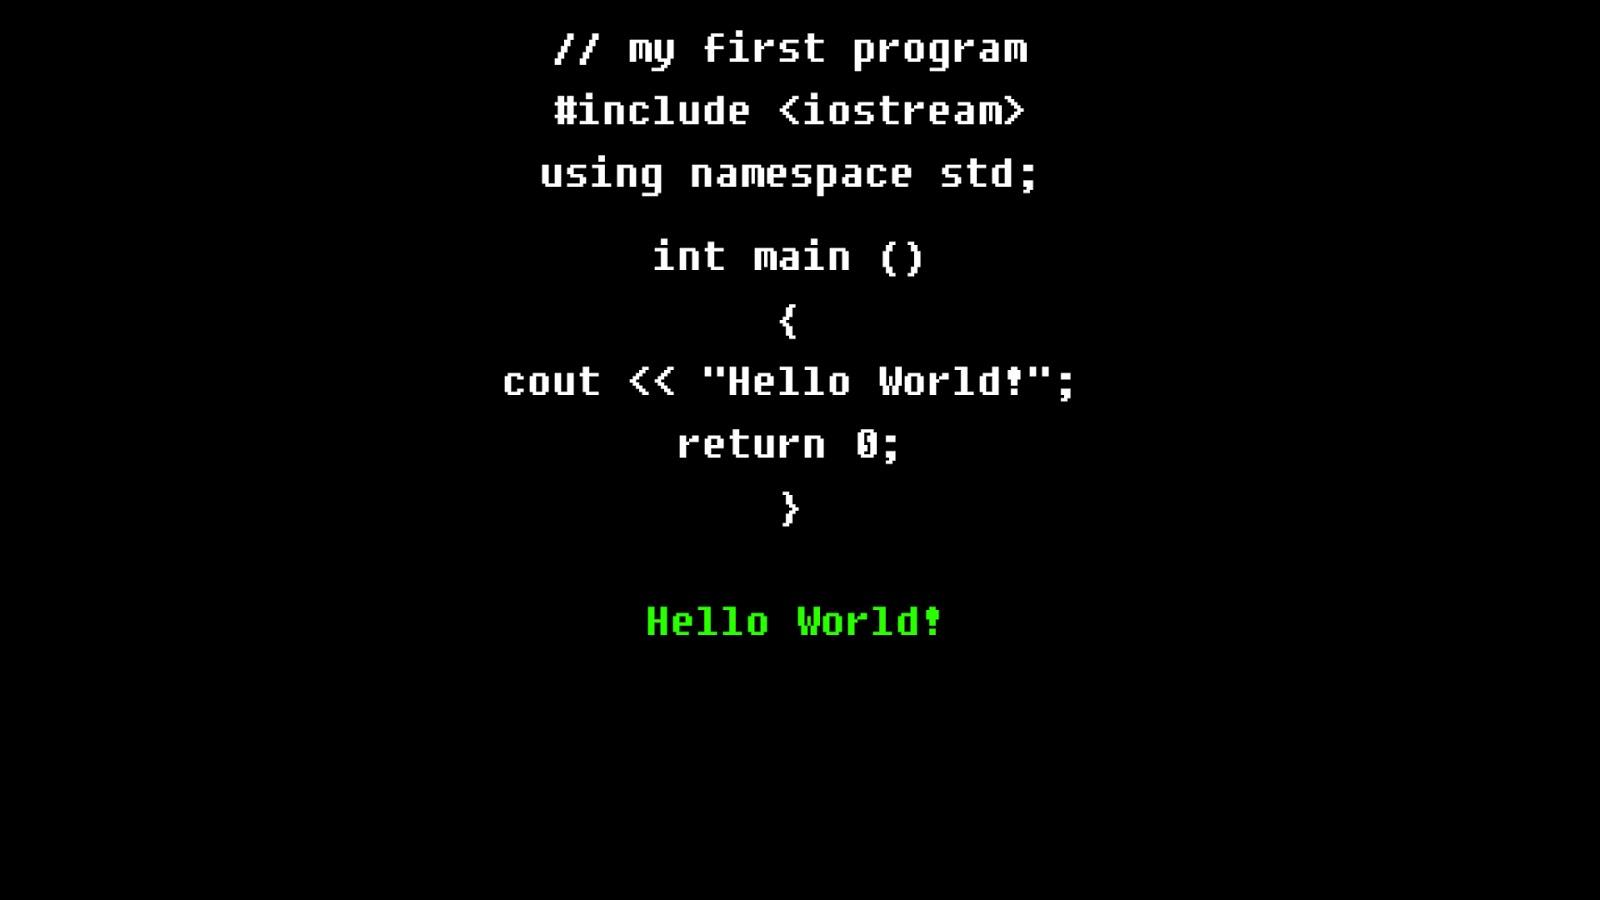 Wallpaper For Every Programmers #Wallpaper #programming - Mithilesh Joshi